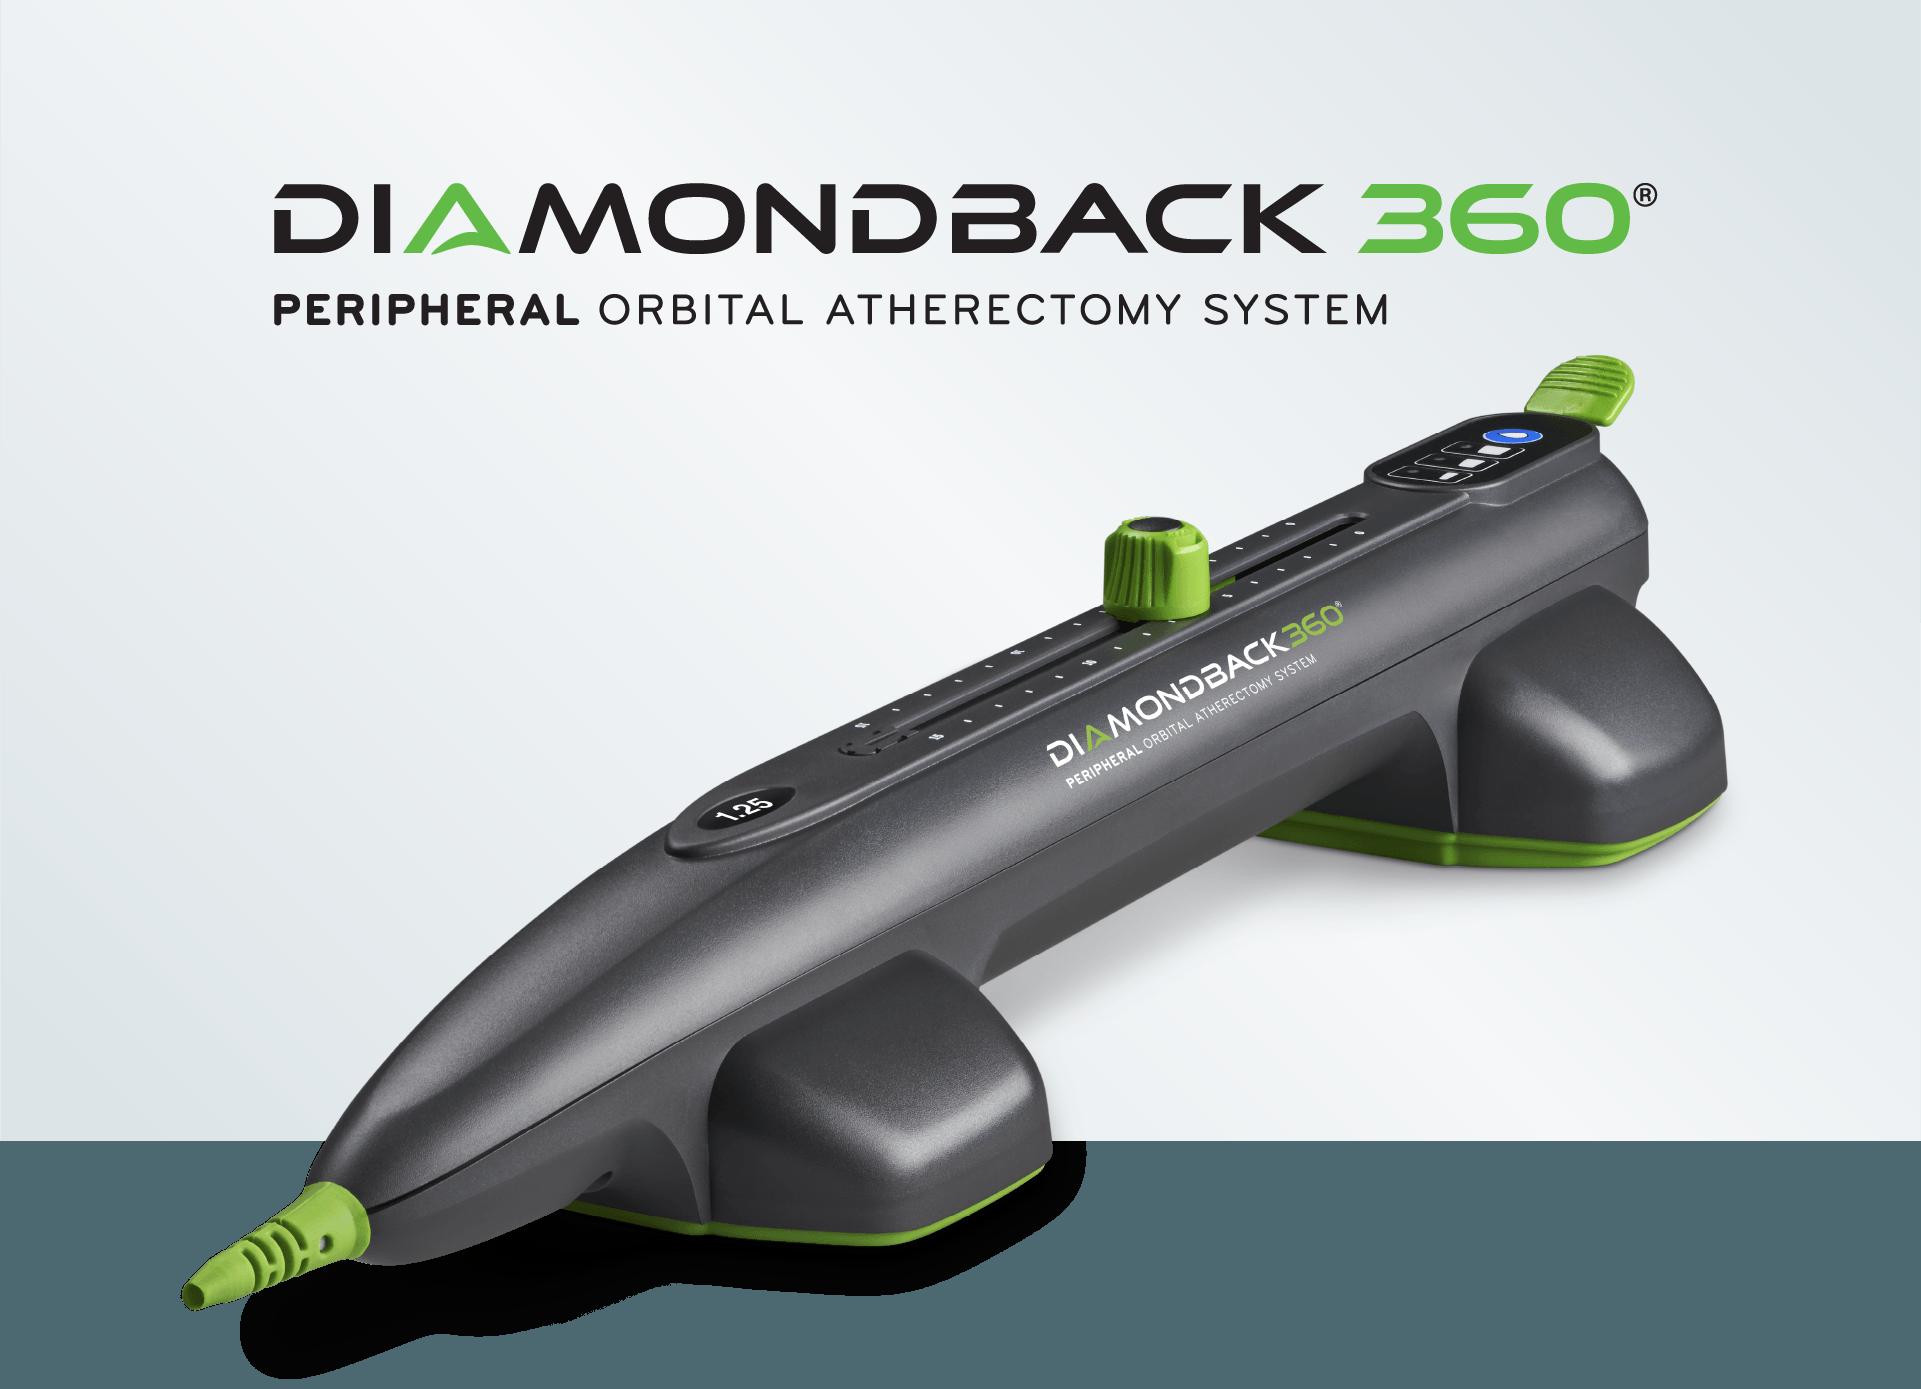 Diamondback 360® product shot